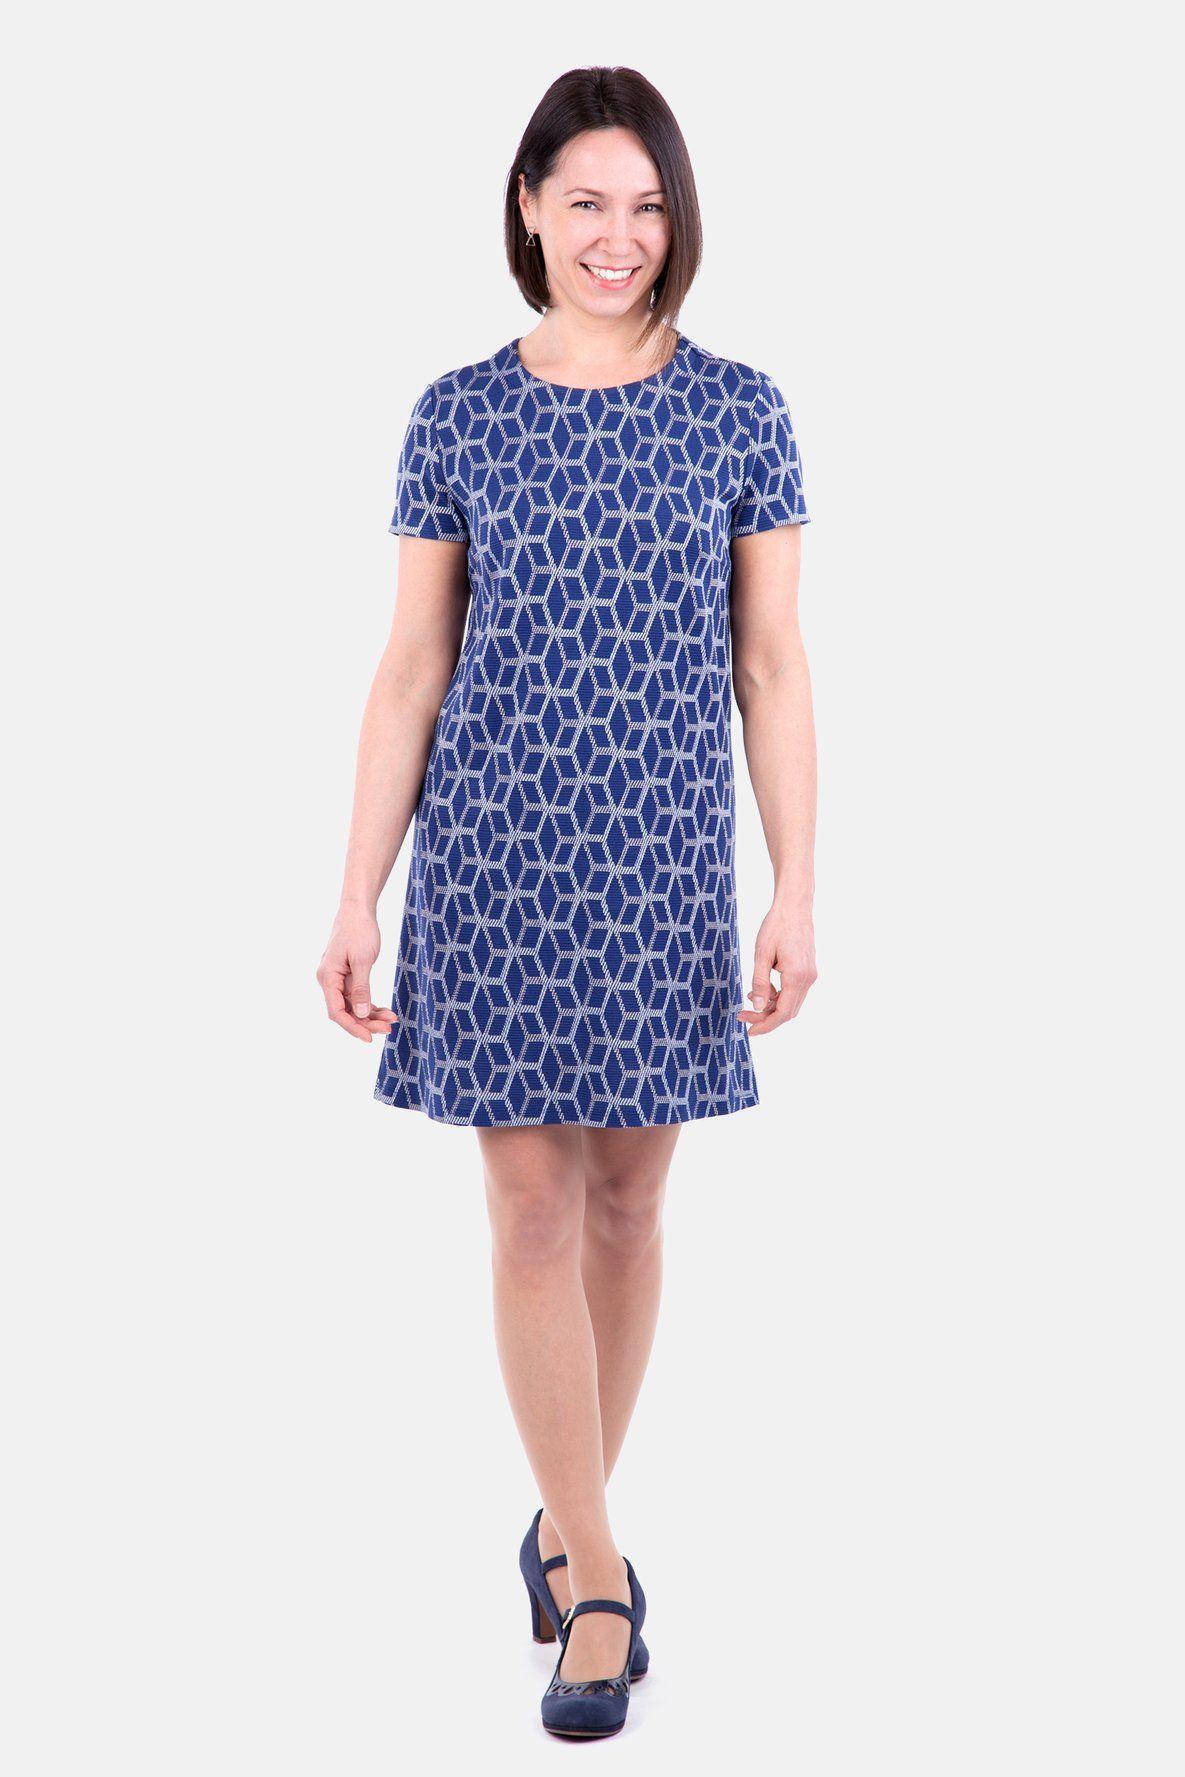 Schnittmuster A-Linien-Kleid Stretch Jacquard blau (mit